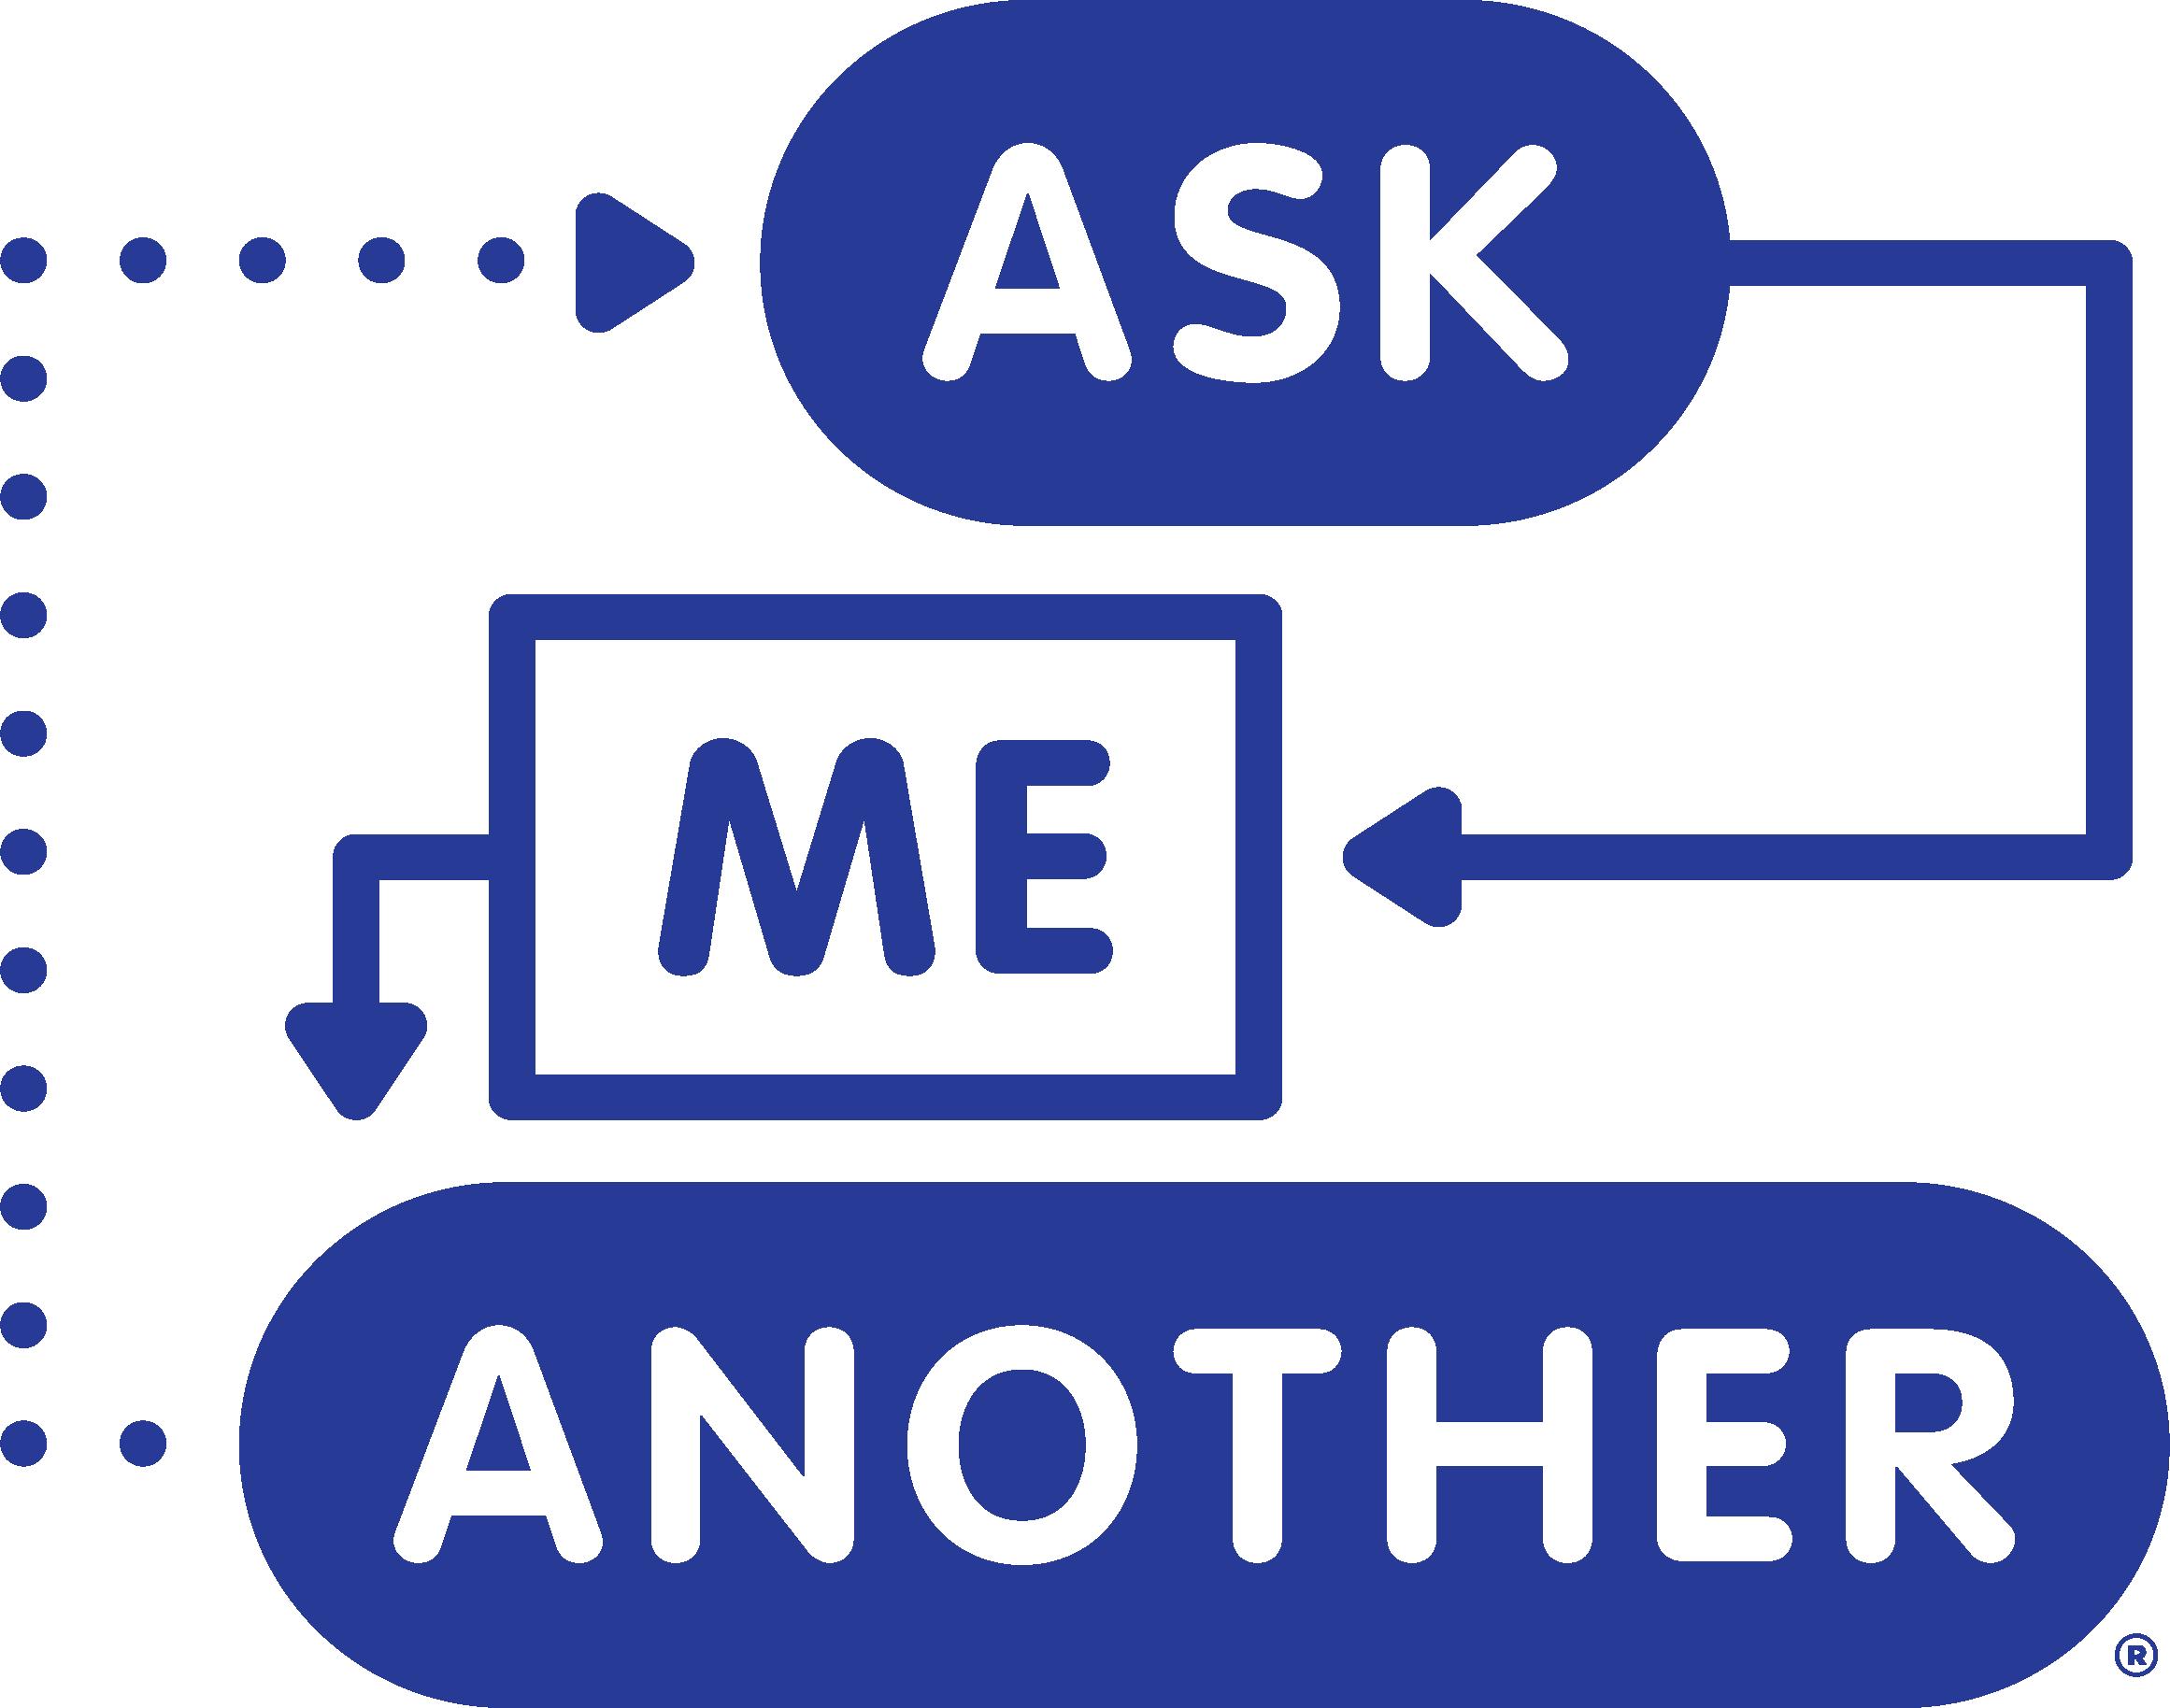 Ask Me Another Kuar